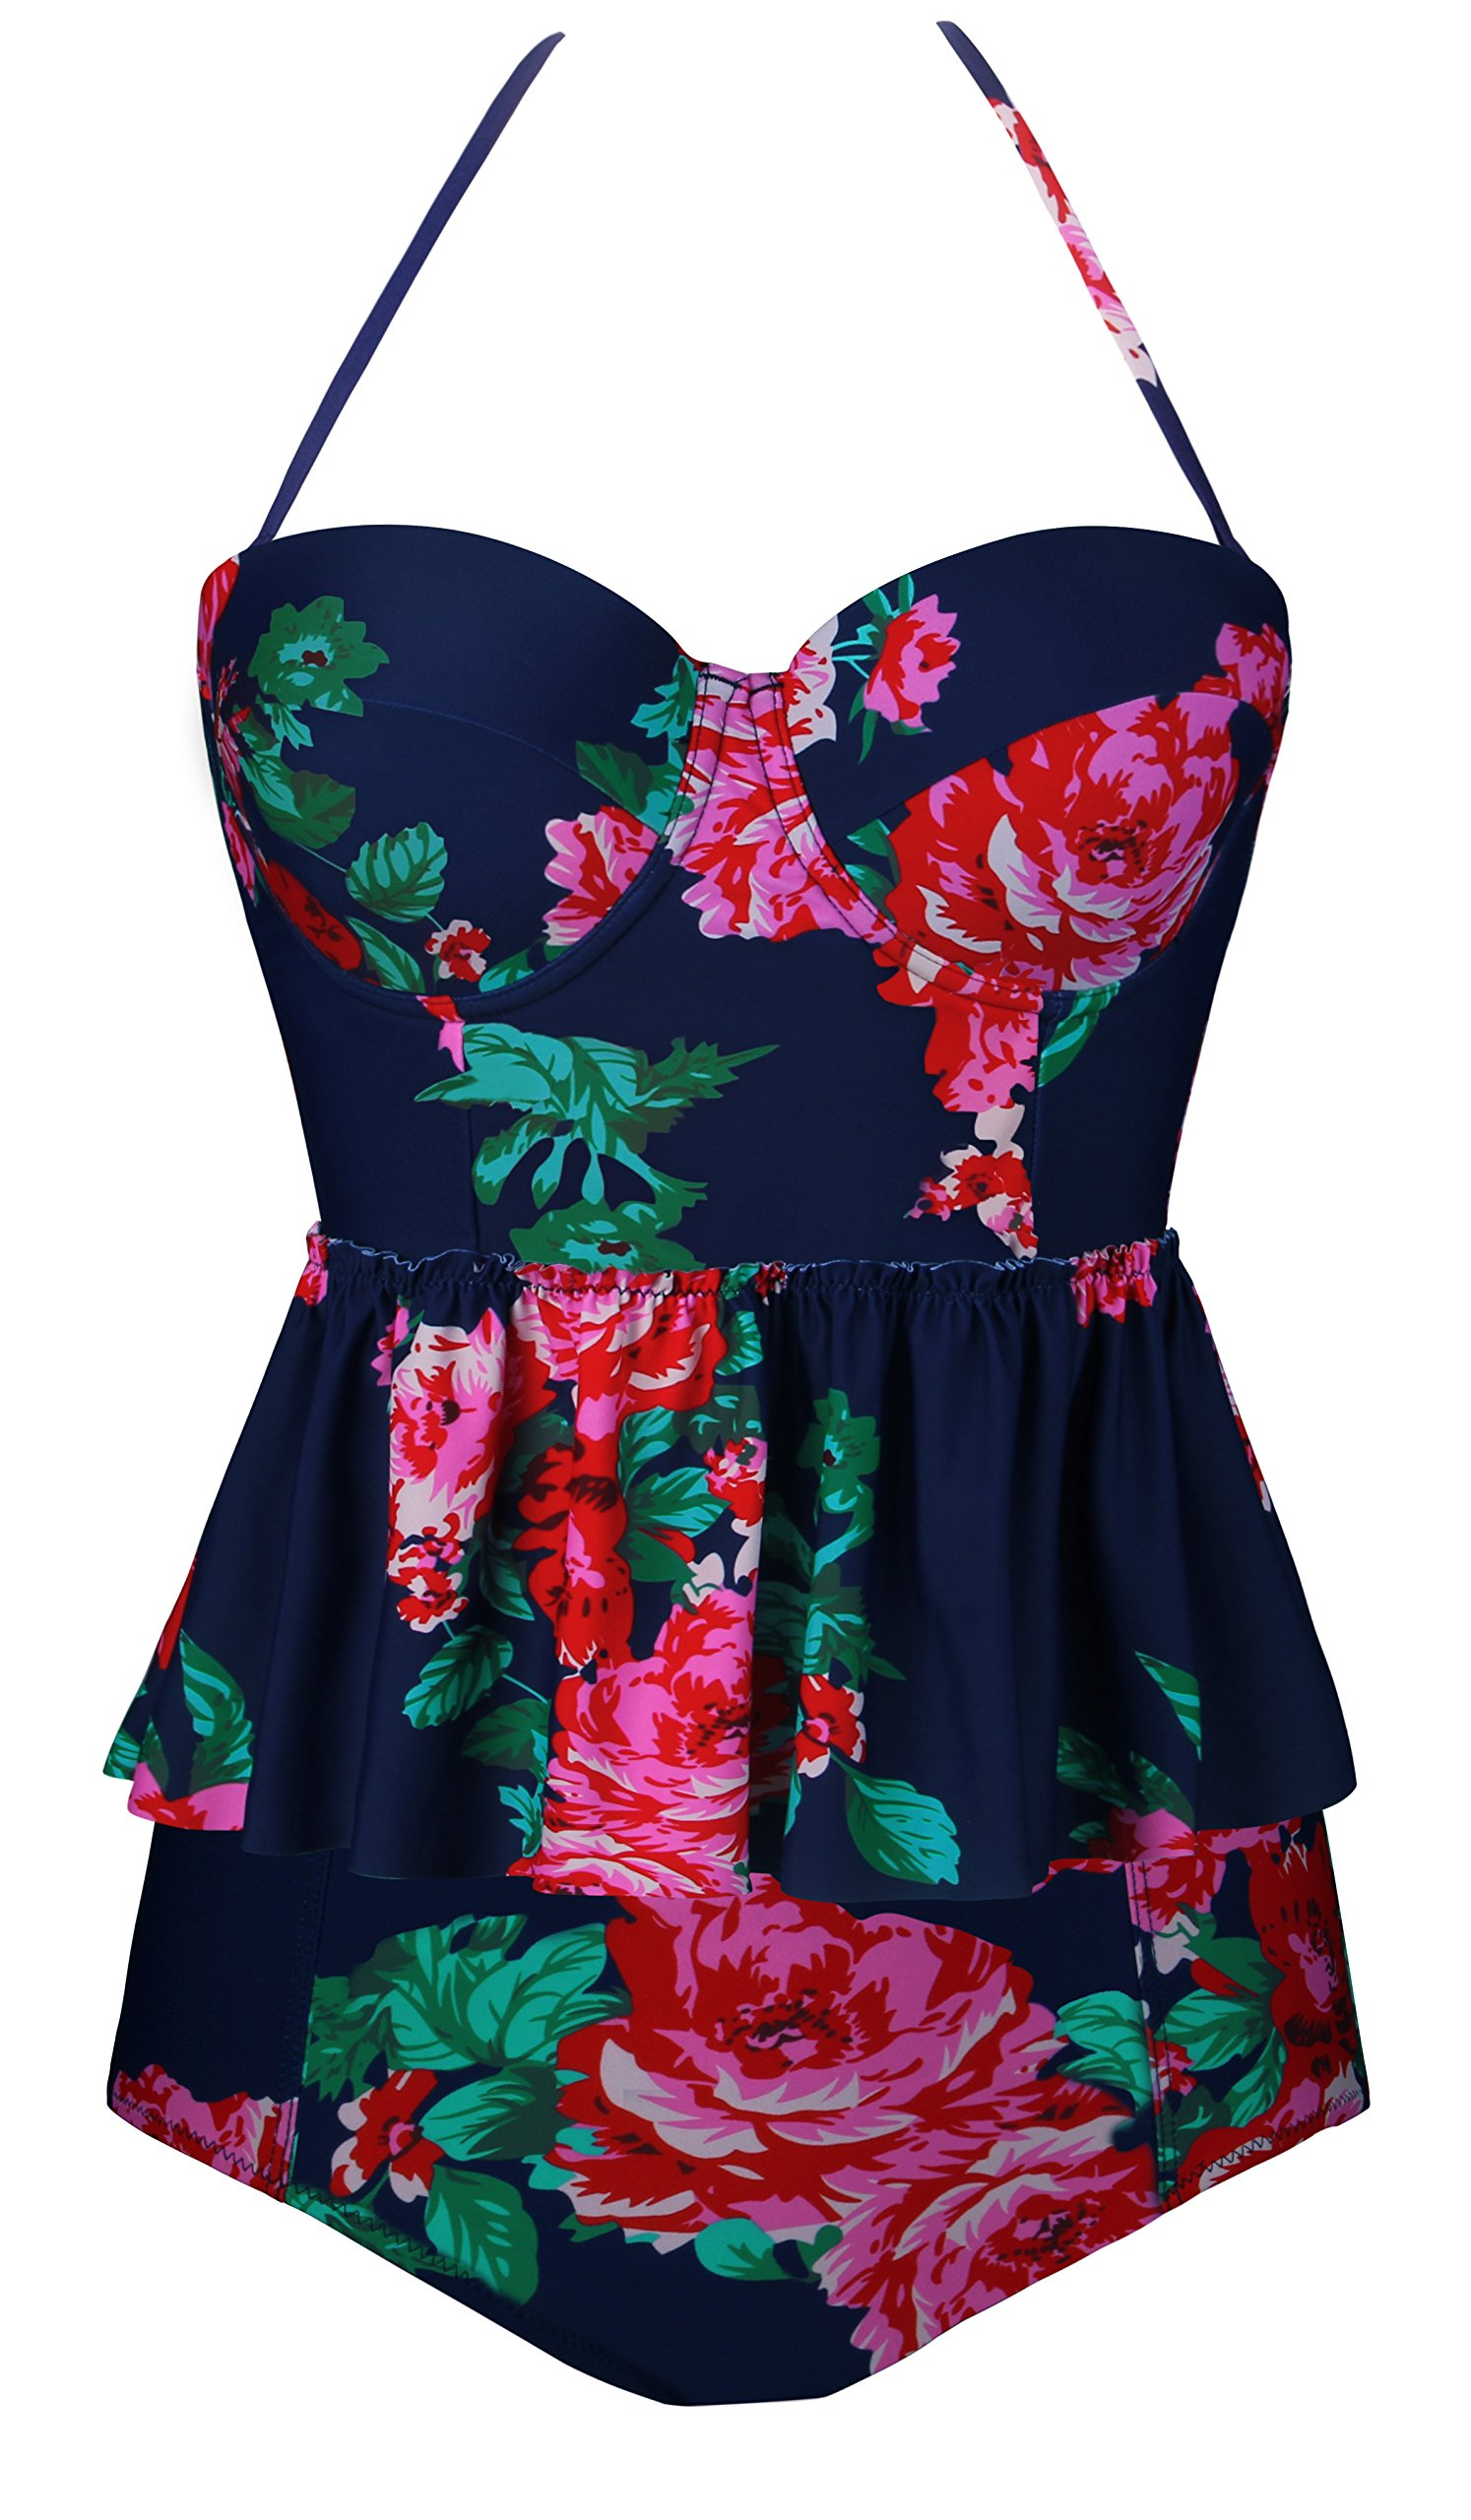 Angerella Vintage Swimwear Floral Print Bottom Tankini Bikini Peplum Swimsuit for Women Navy Blue,2XL